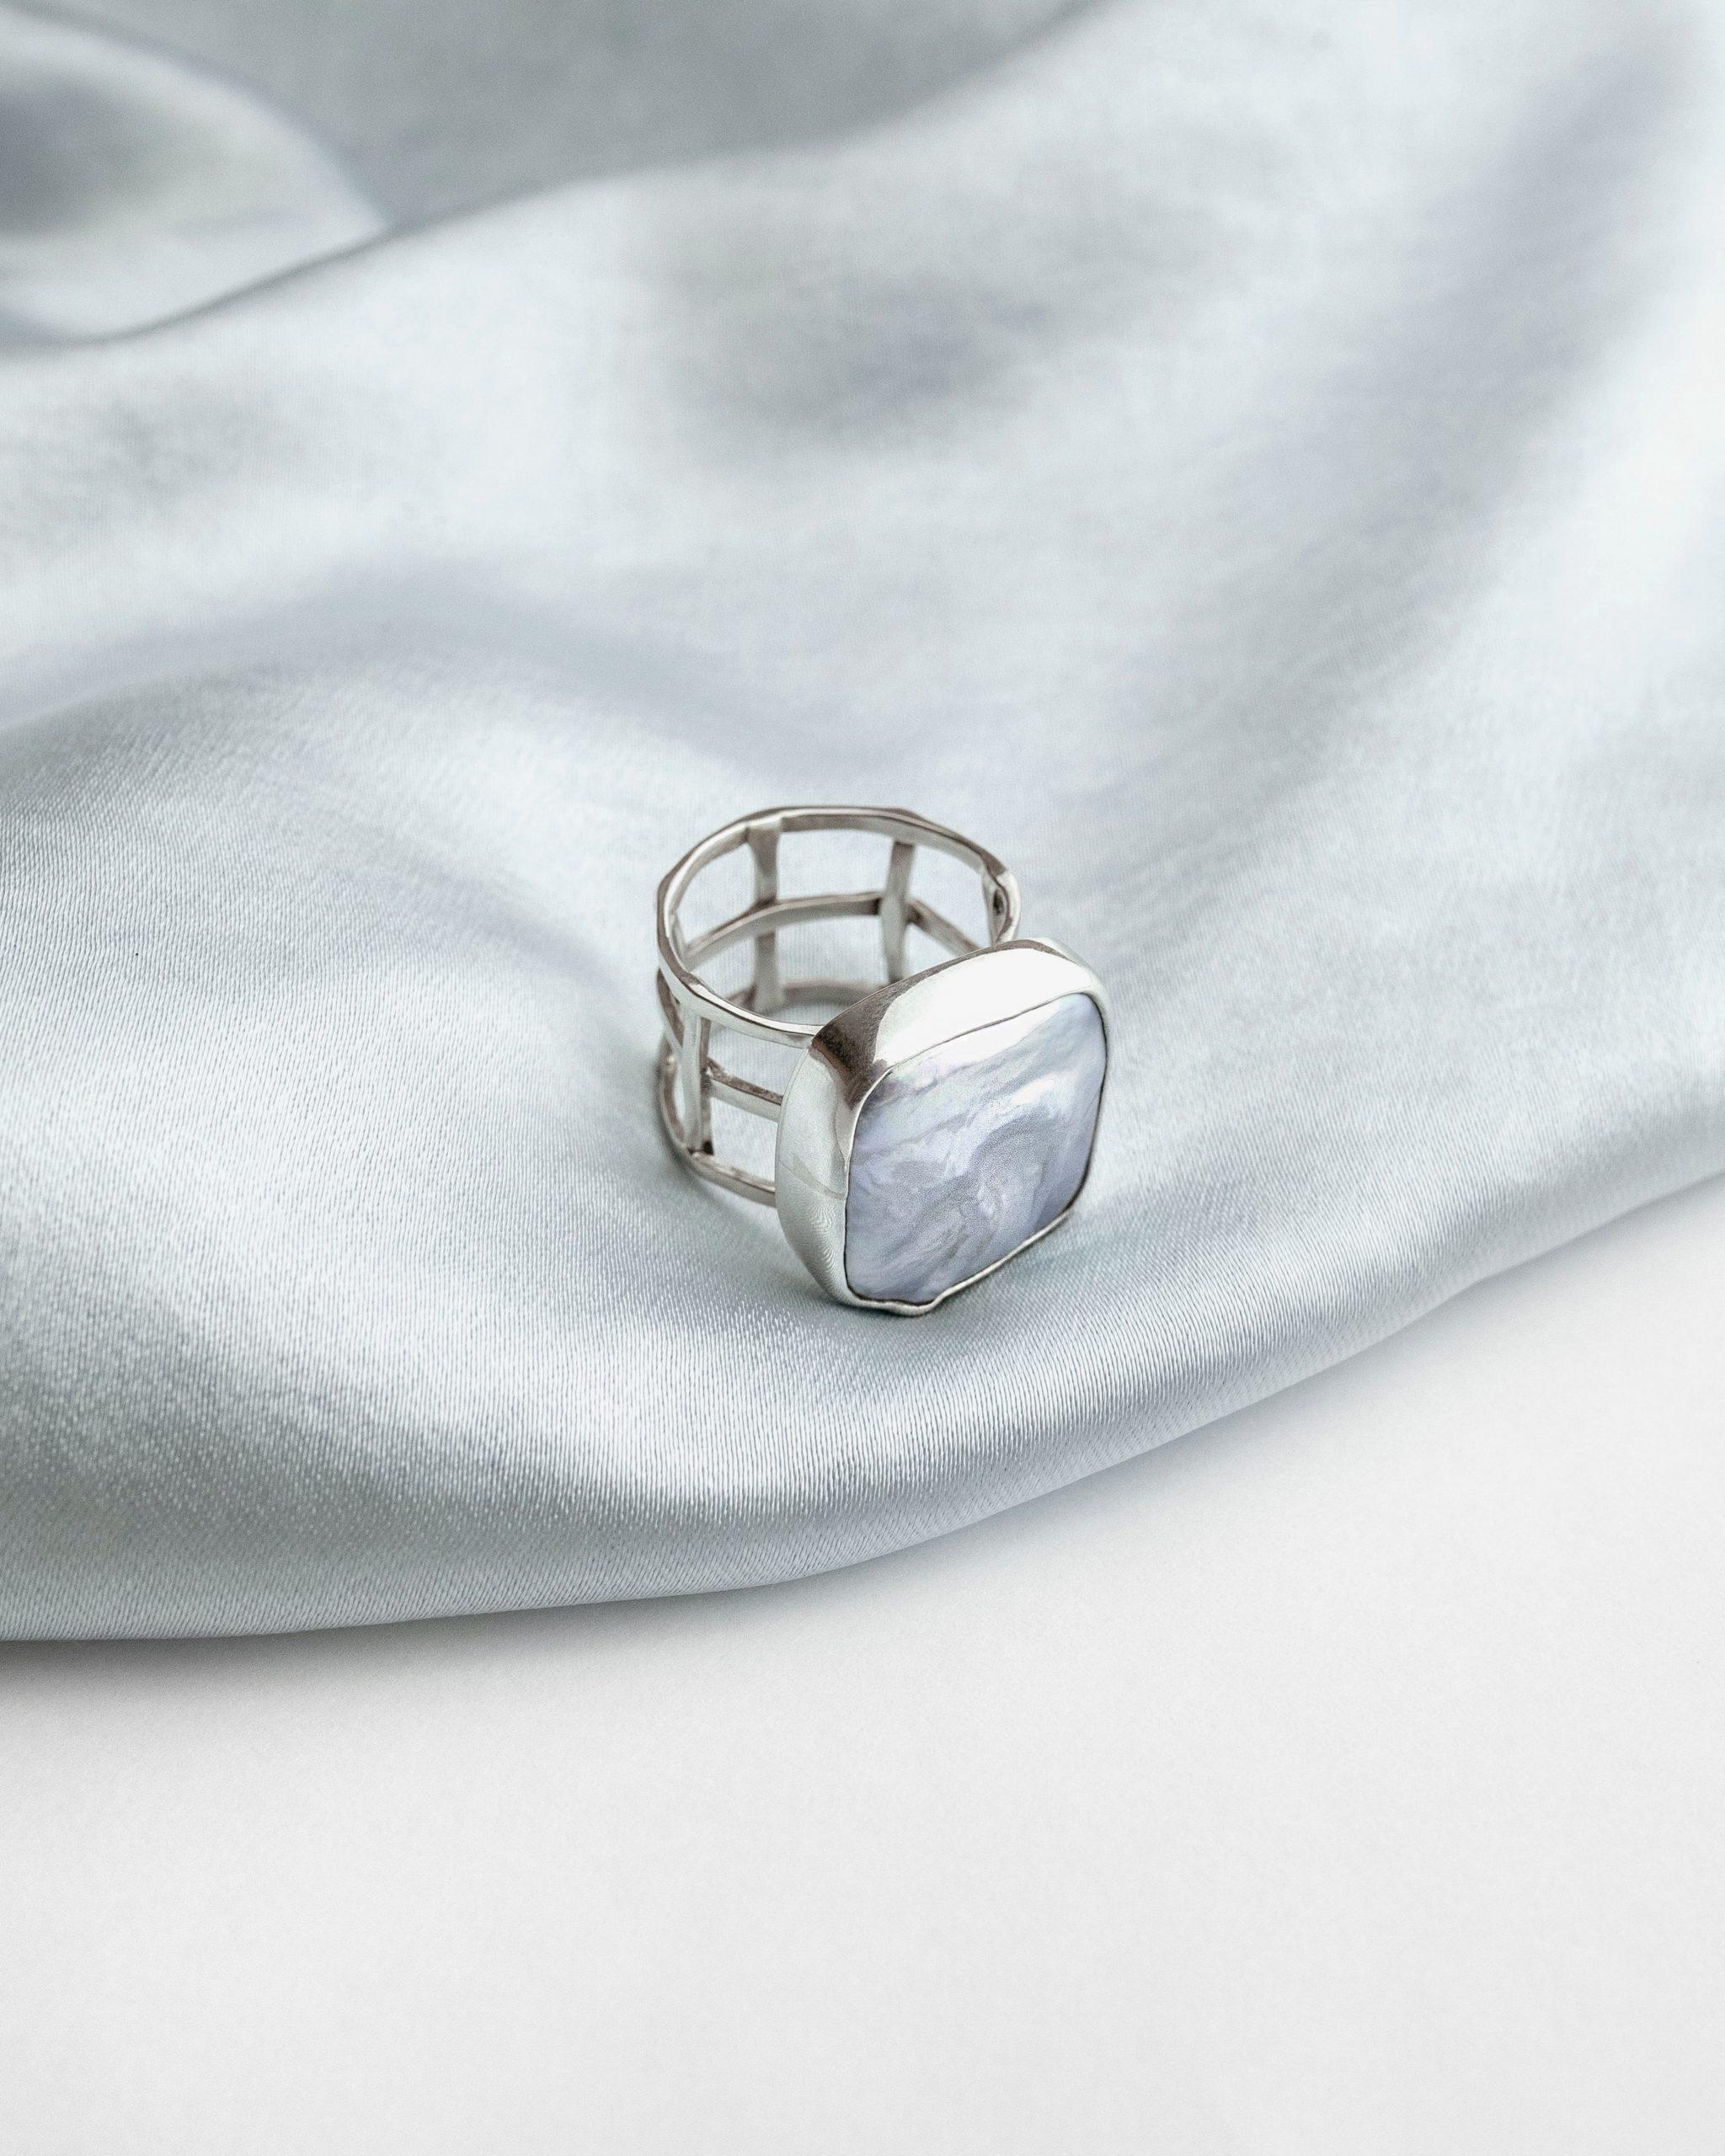 a photo of silver jewelry. photo credit roman shilin unsplash